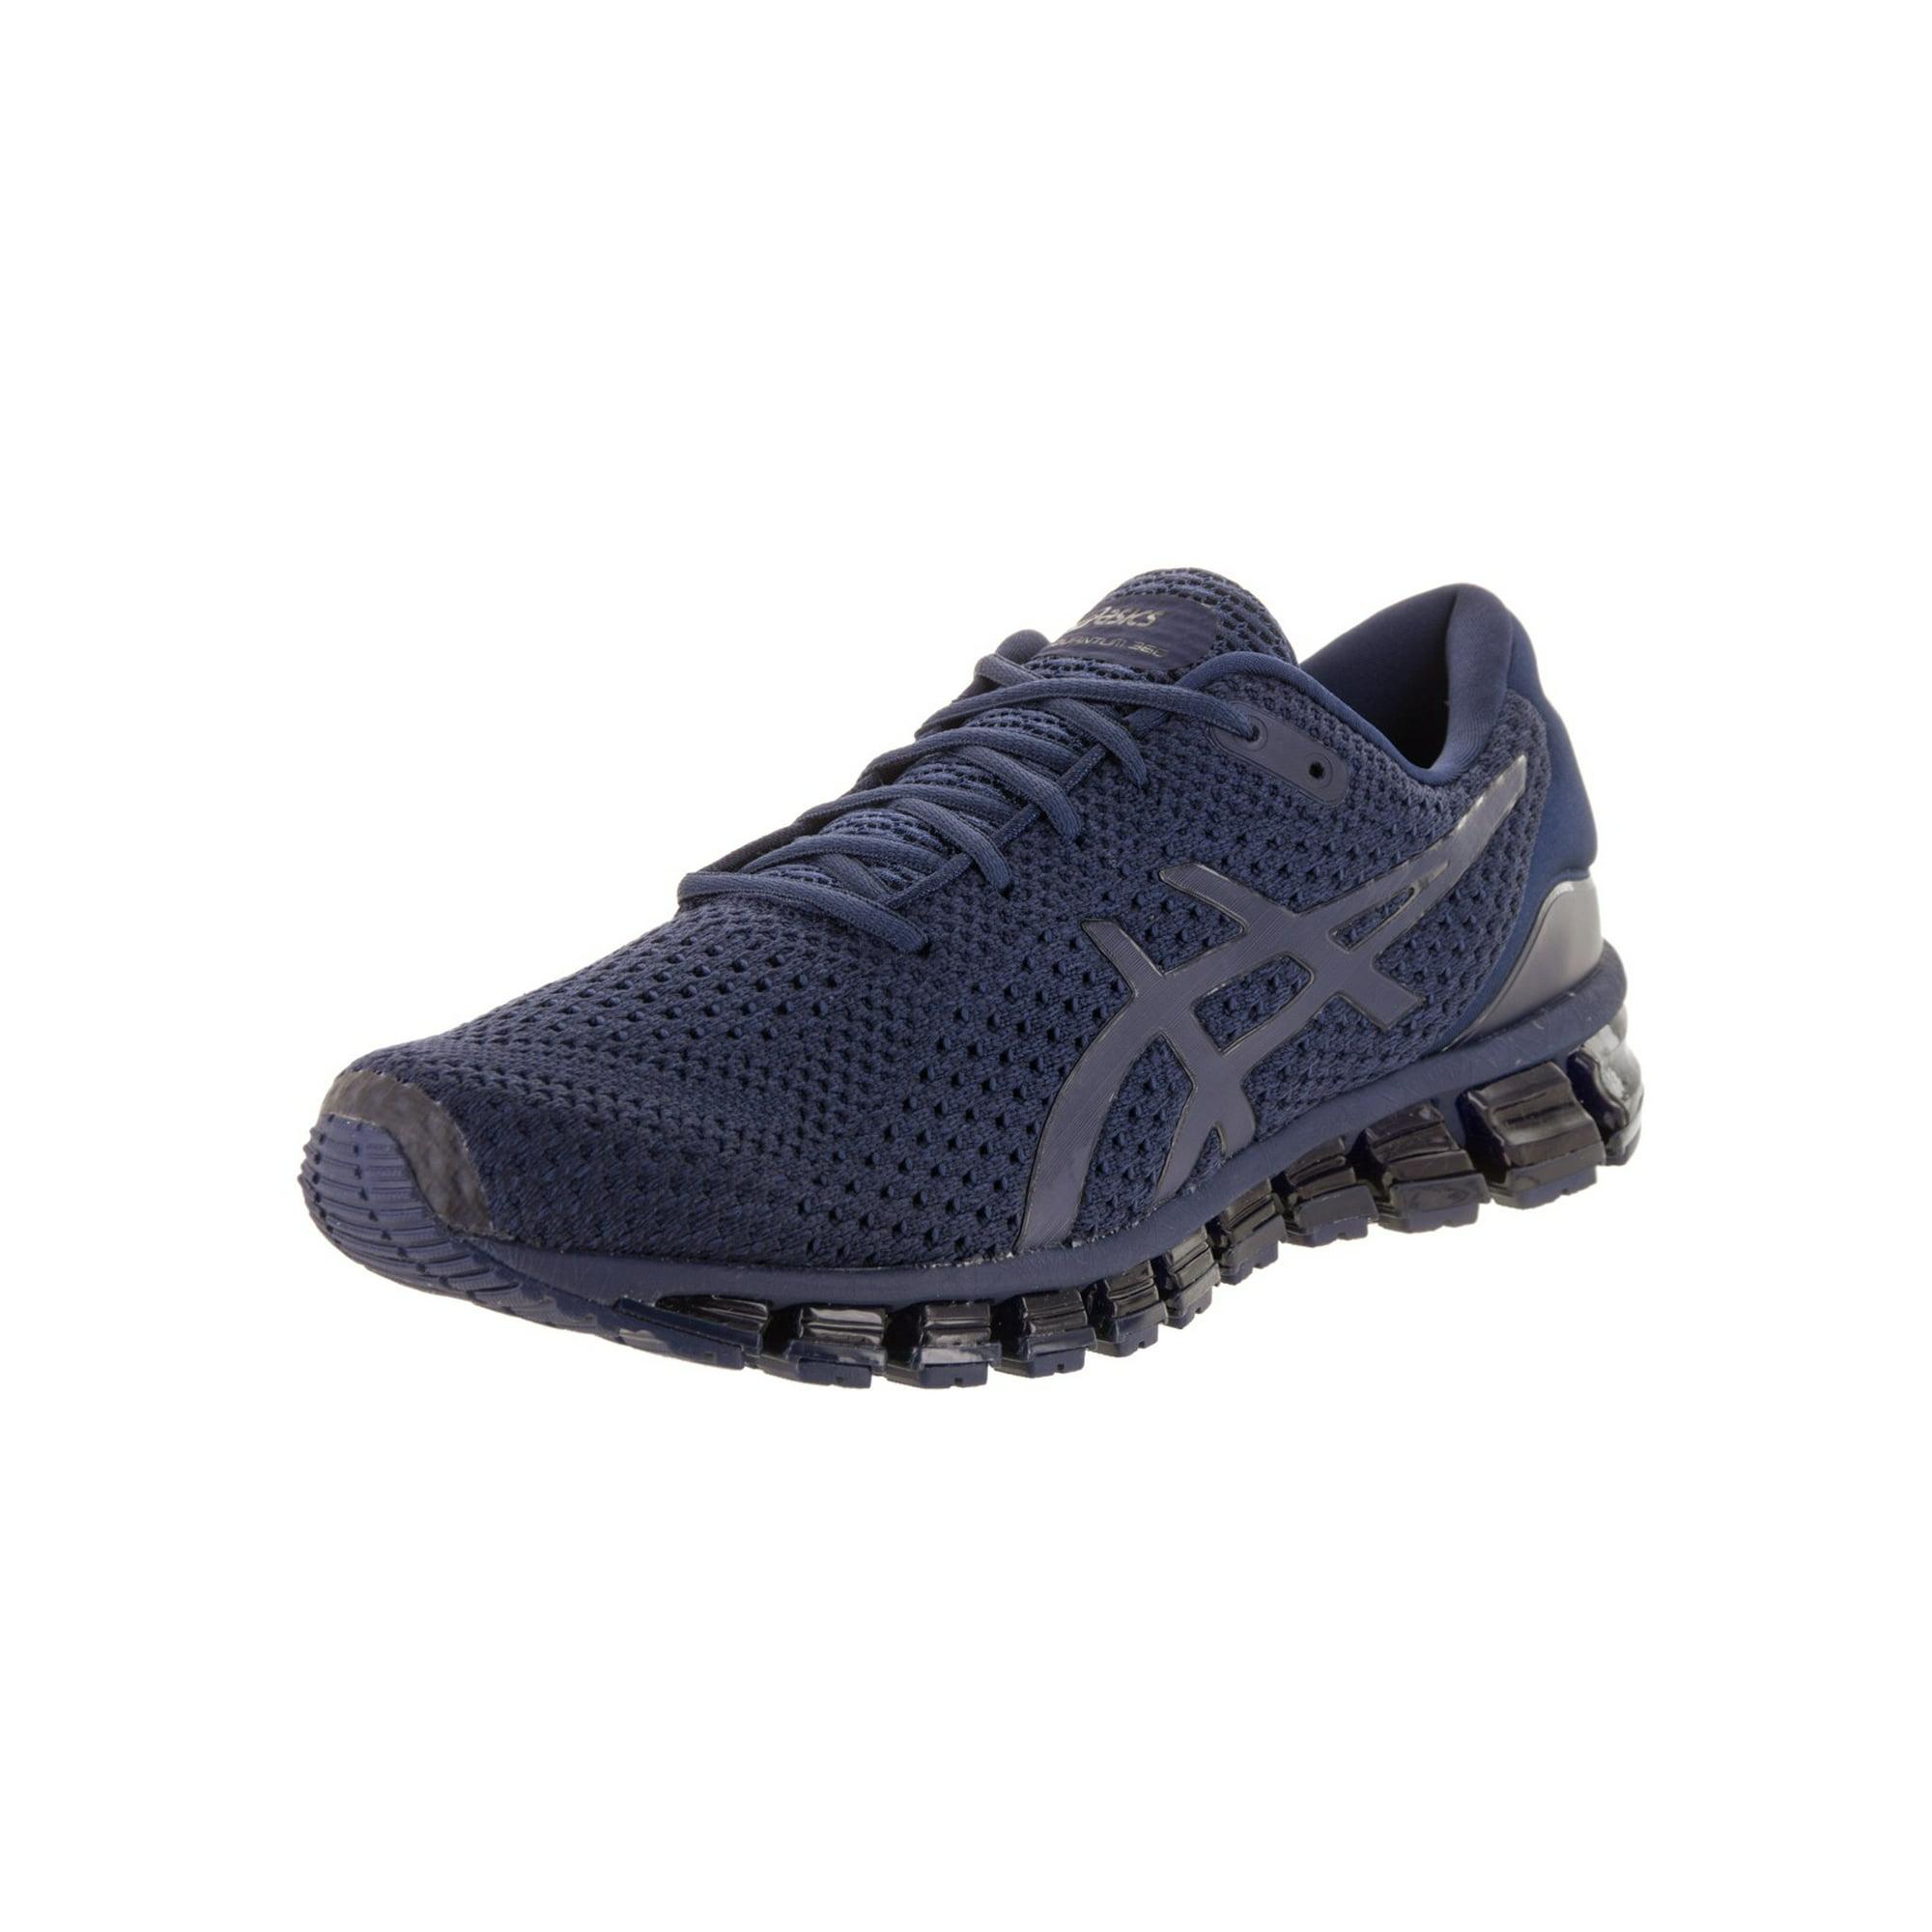 new style b5ddc e5cb6 Asics Men's Gel-Quantum 360 Knit 2 Running Shoe